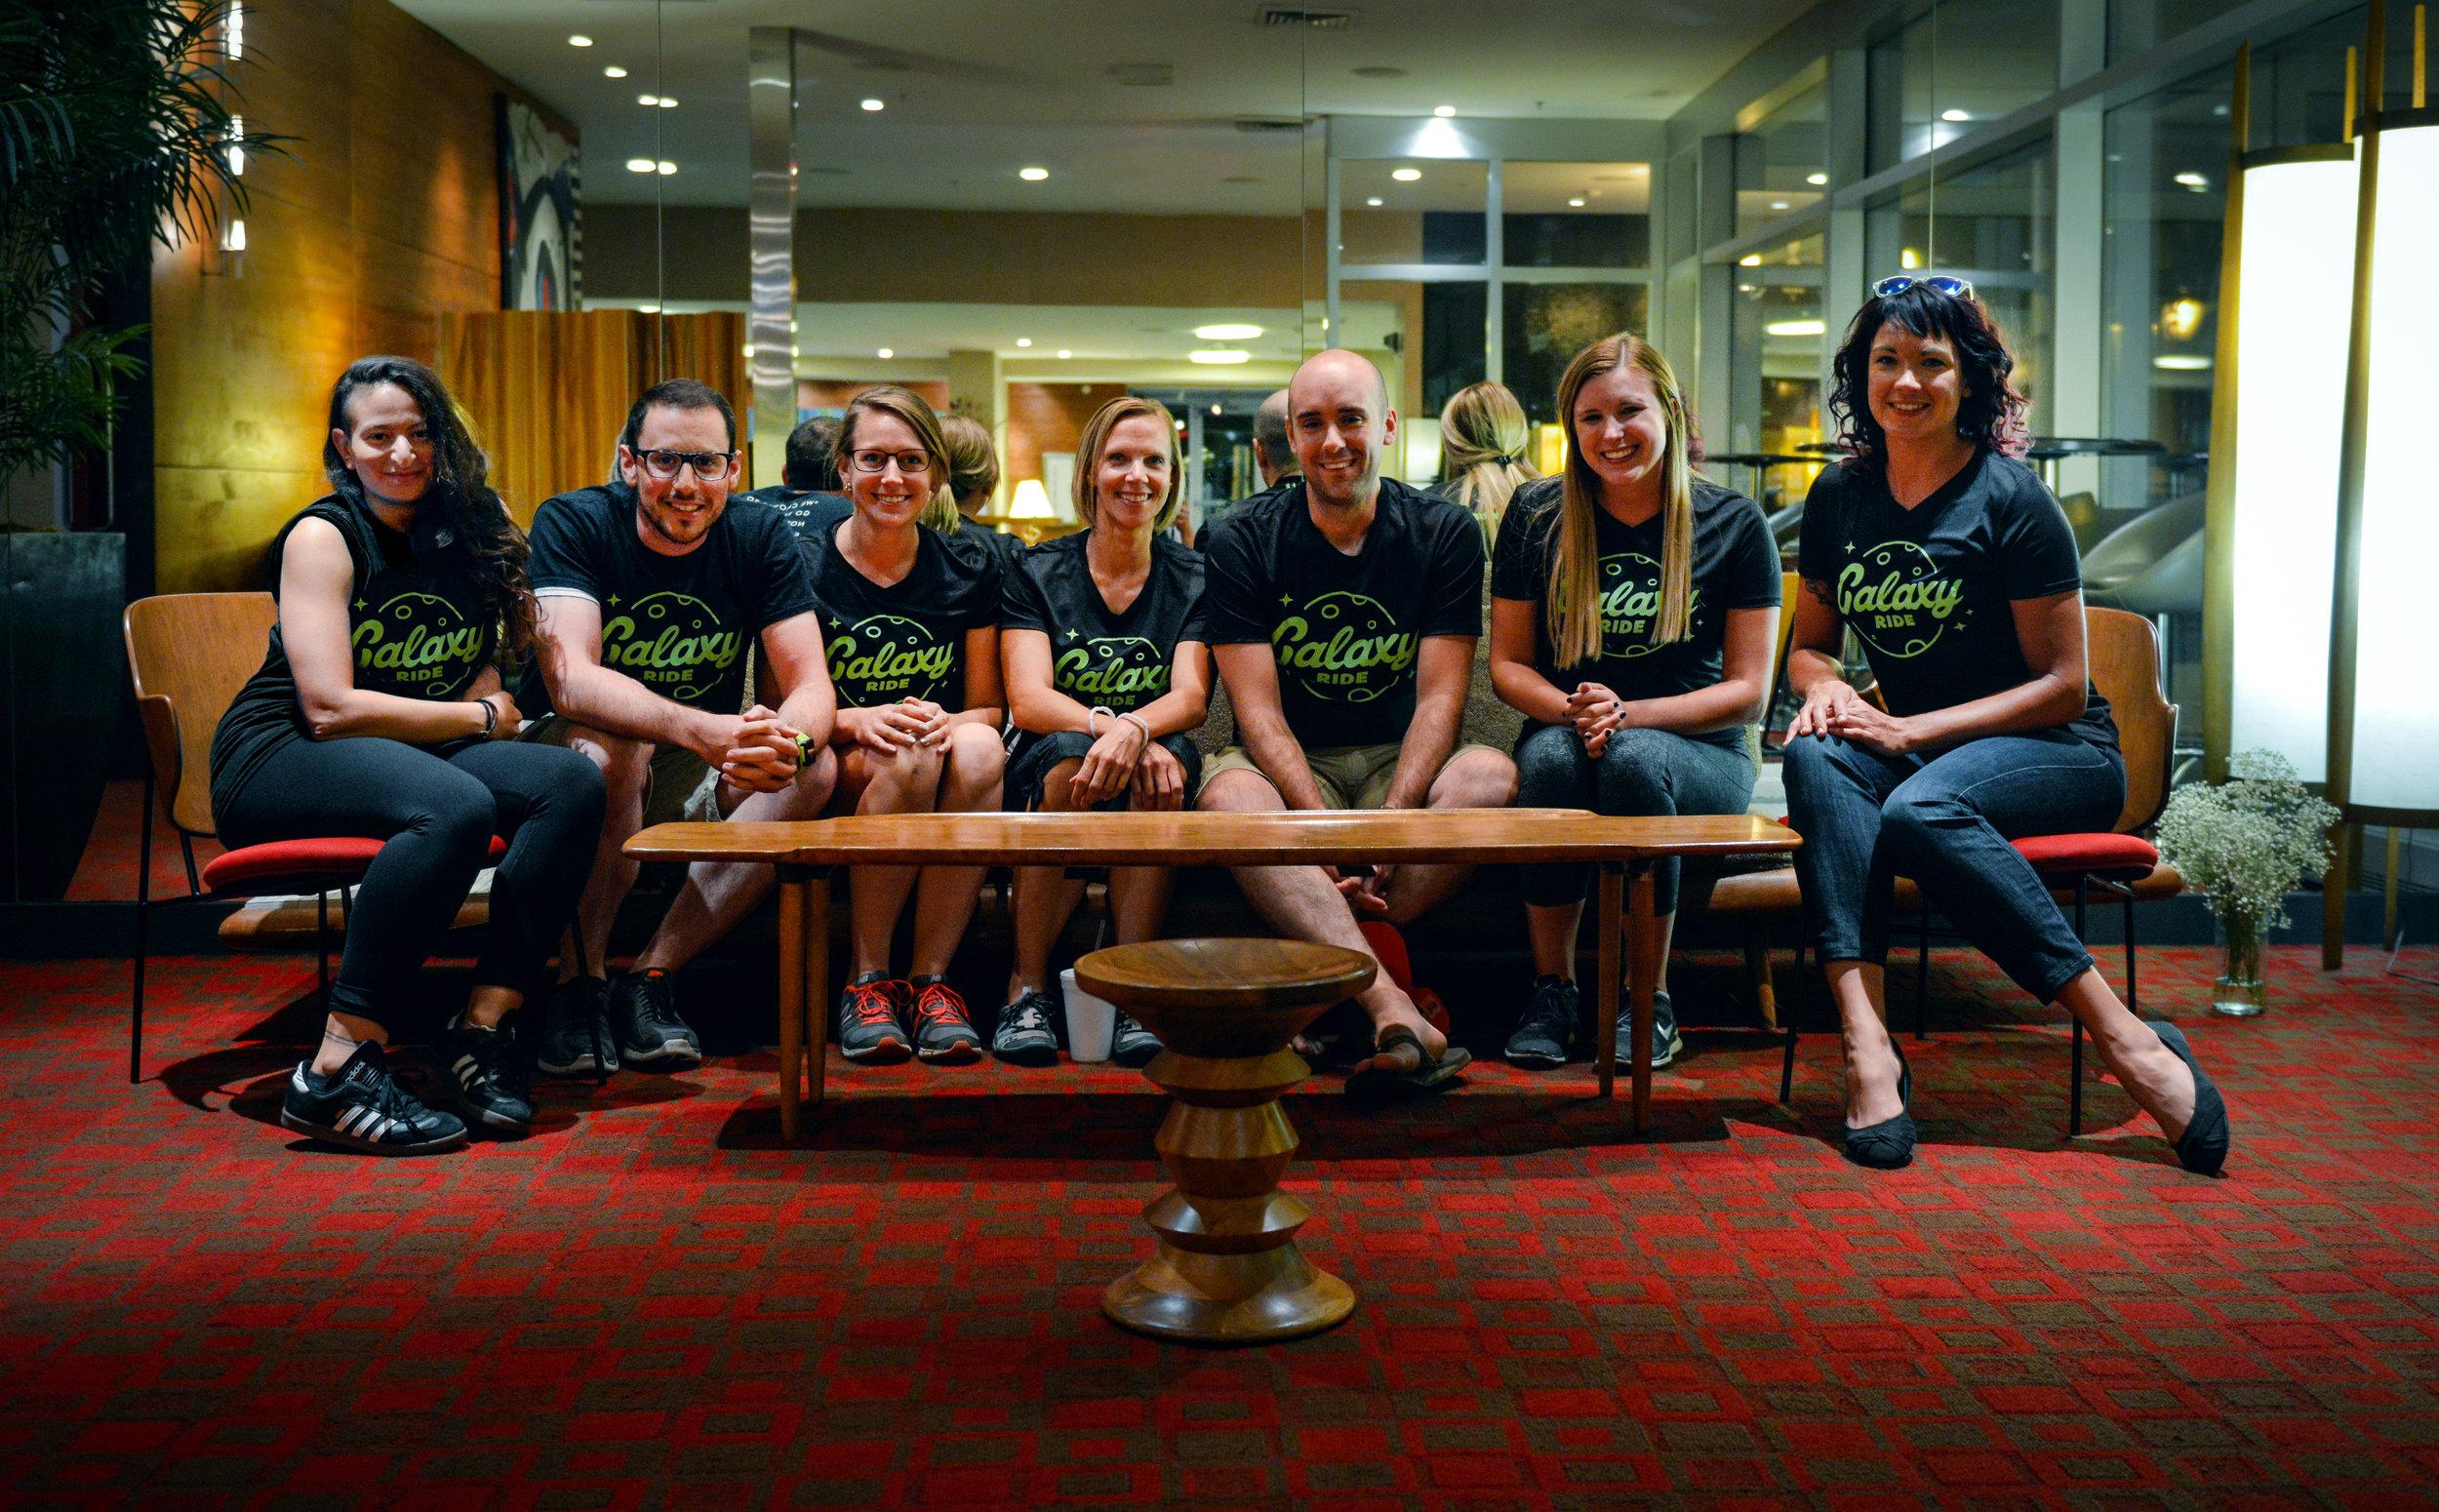 Team Galaxy Ride (L to R): Leila Makdisi, David Miller, Taryn Mason, Colleen Incandela, Kyle Sater, Christina O'Connell, and me. Photo credit: David Miller